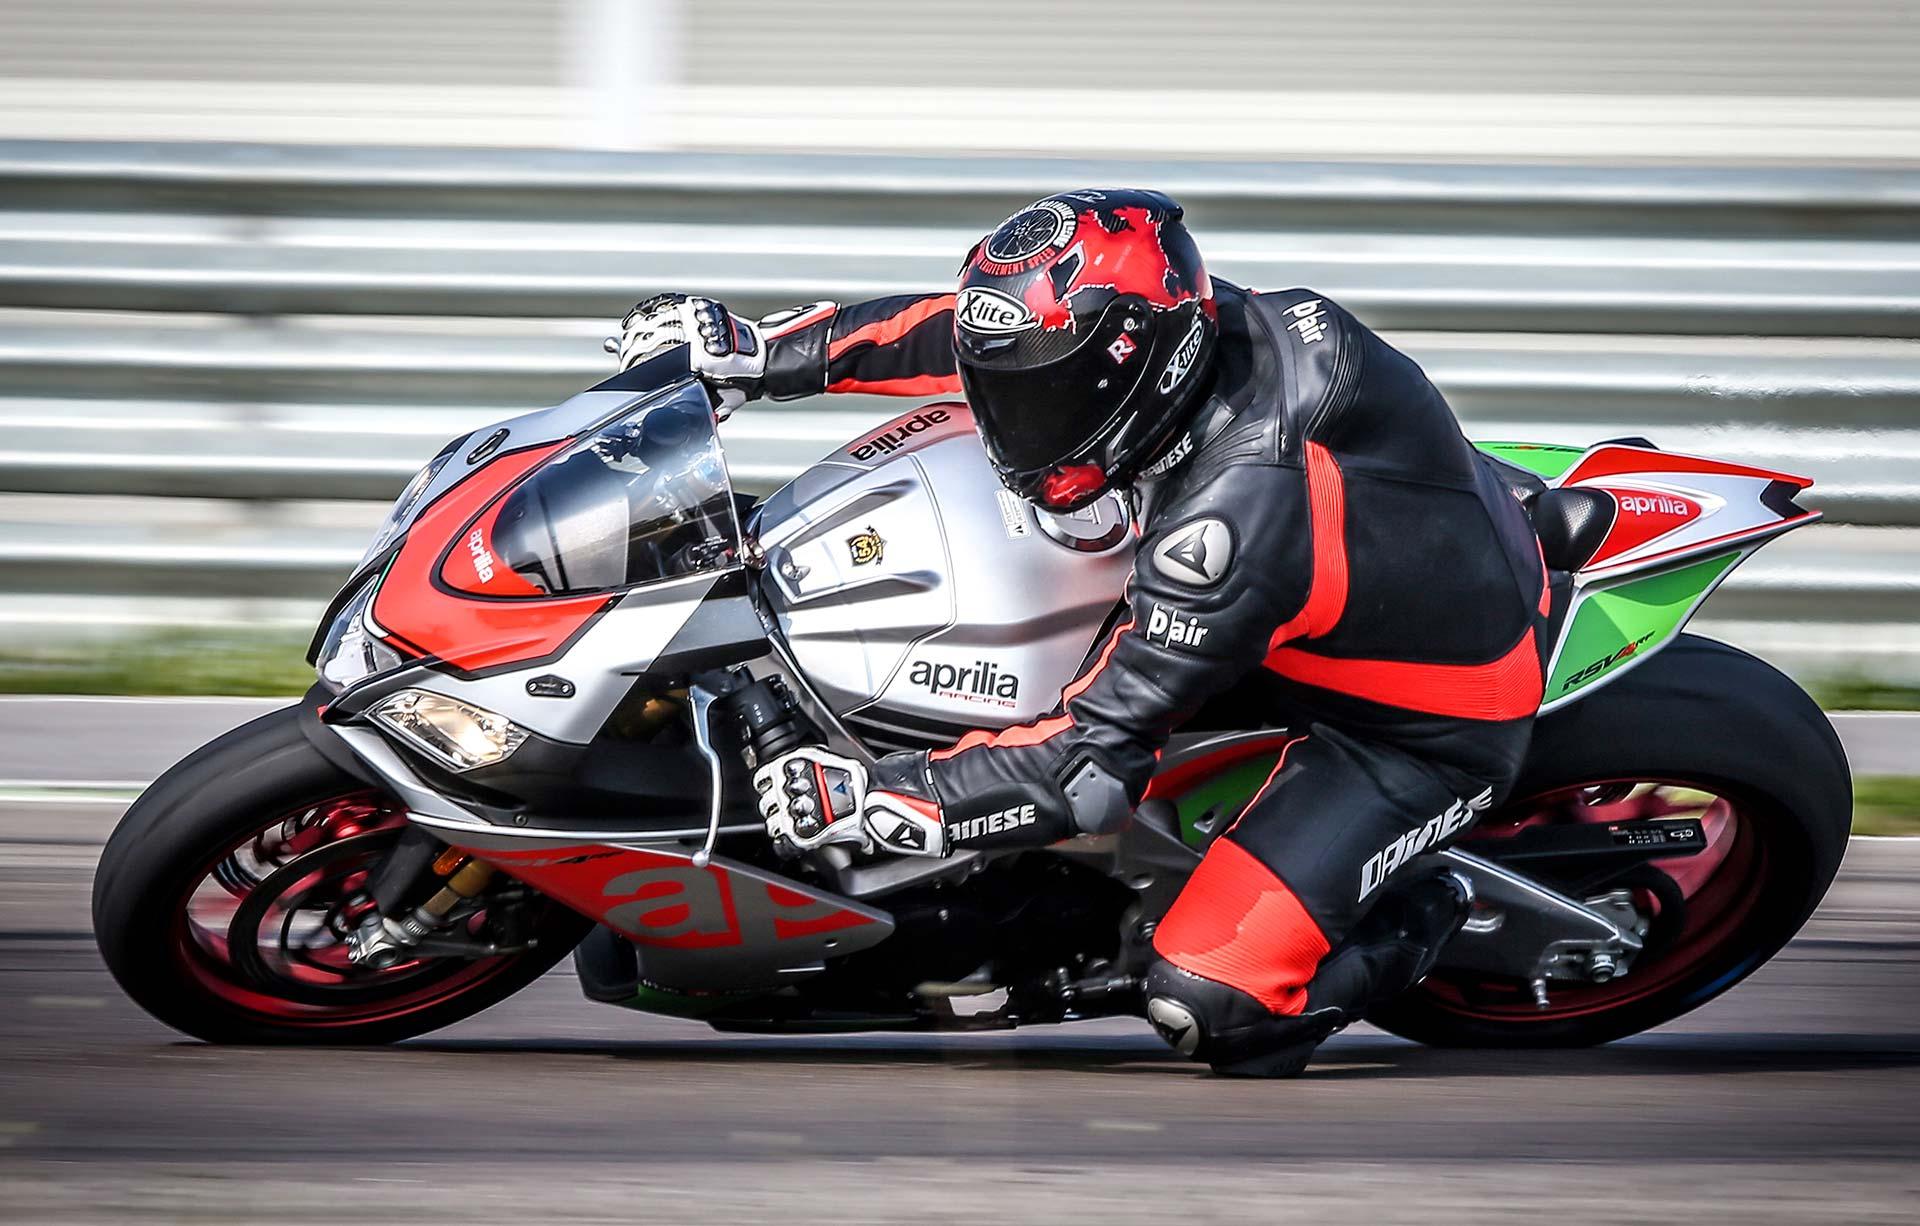 Novità moto - Aprilia RSV4 RF Factory Works - MotorBox